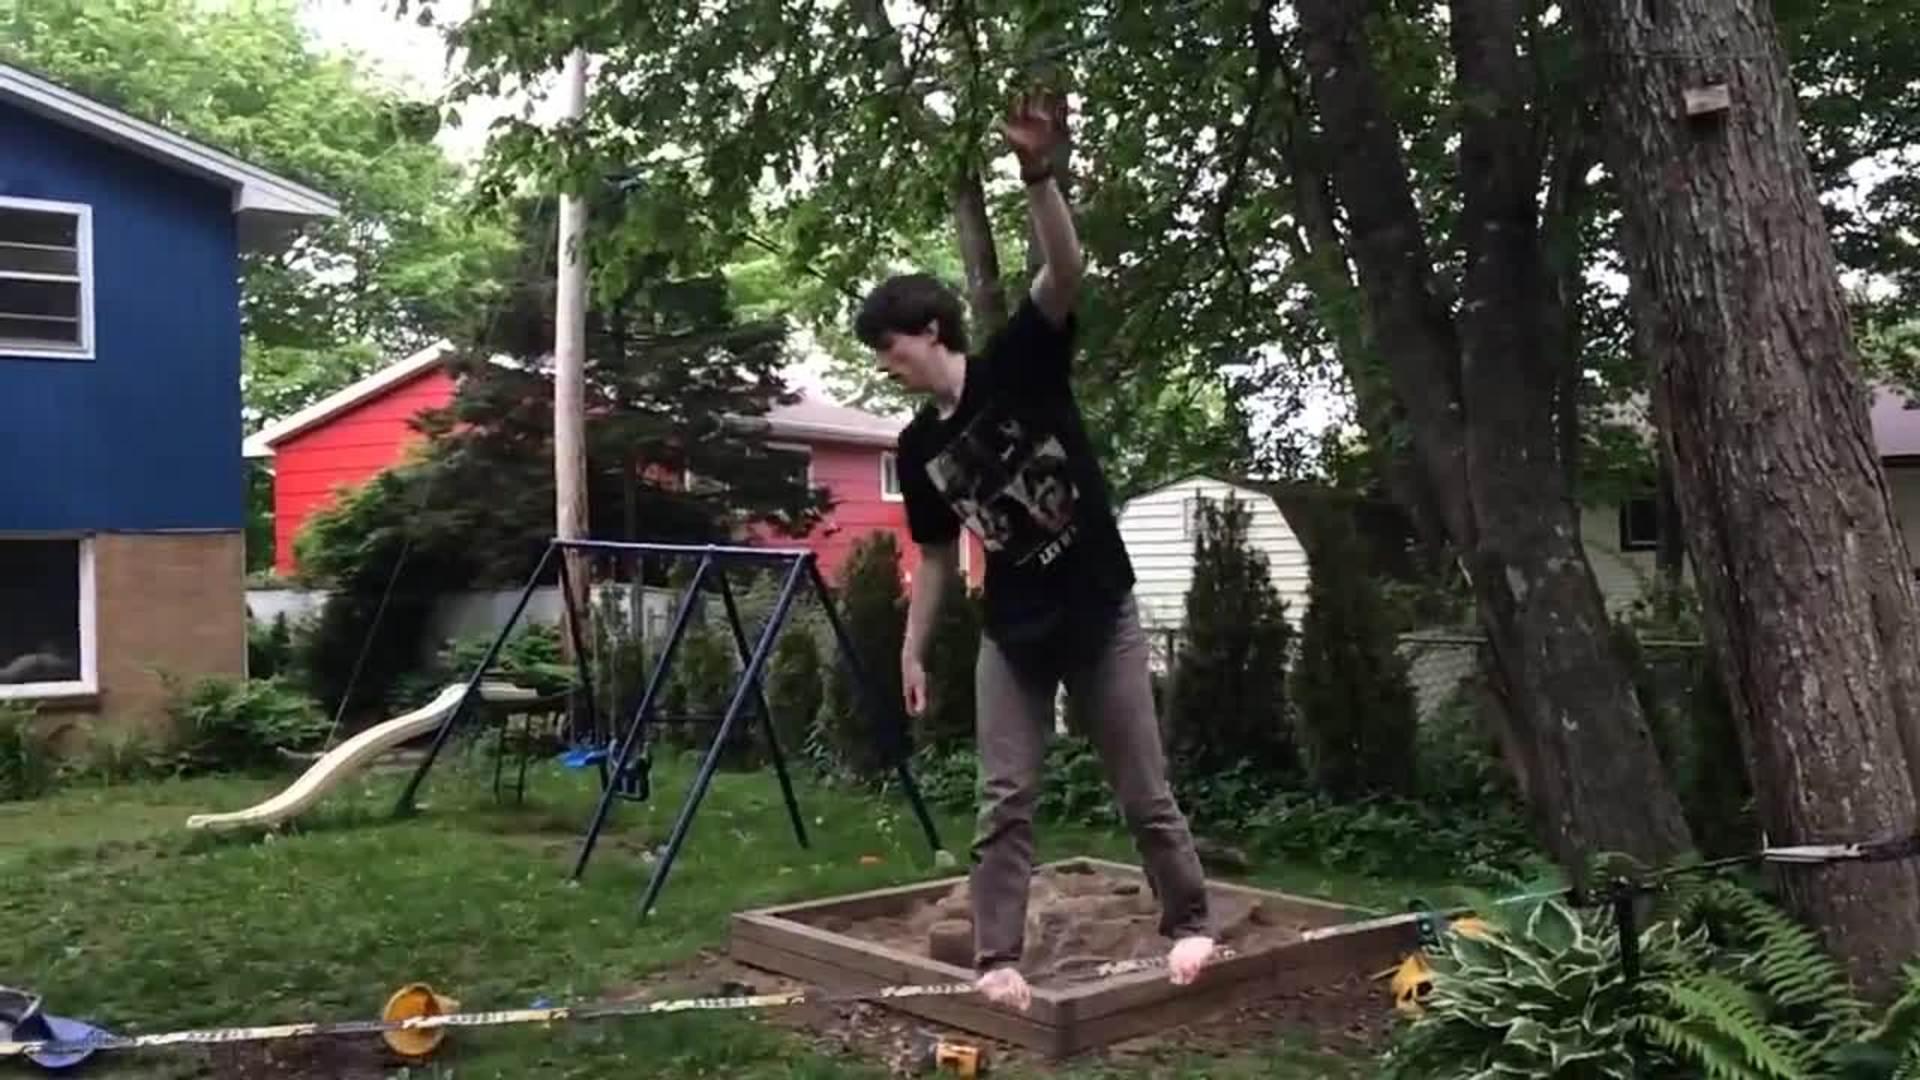 Backyard Slackline Falls Off